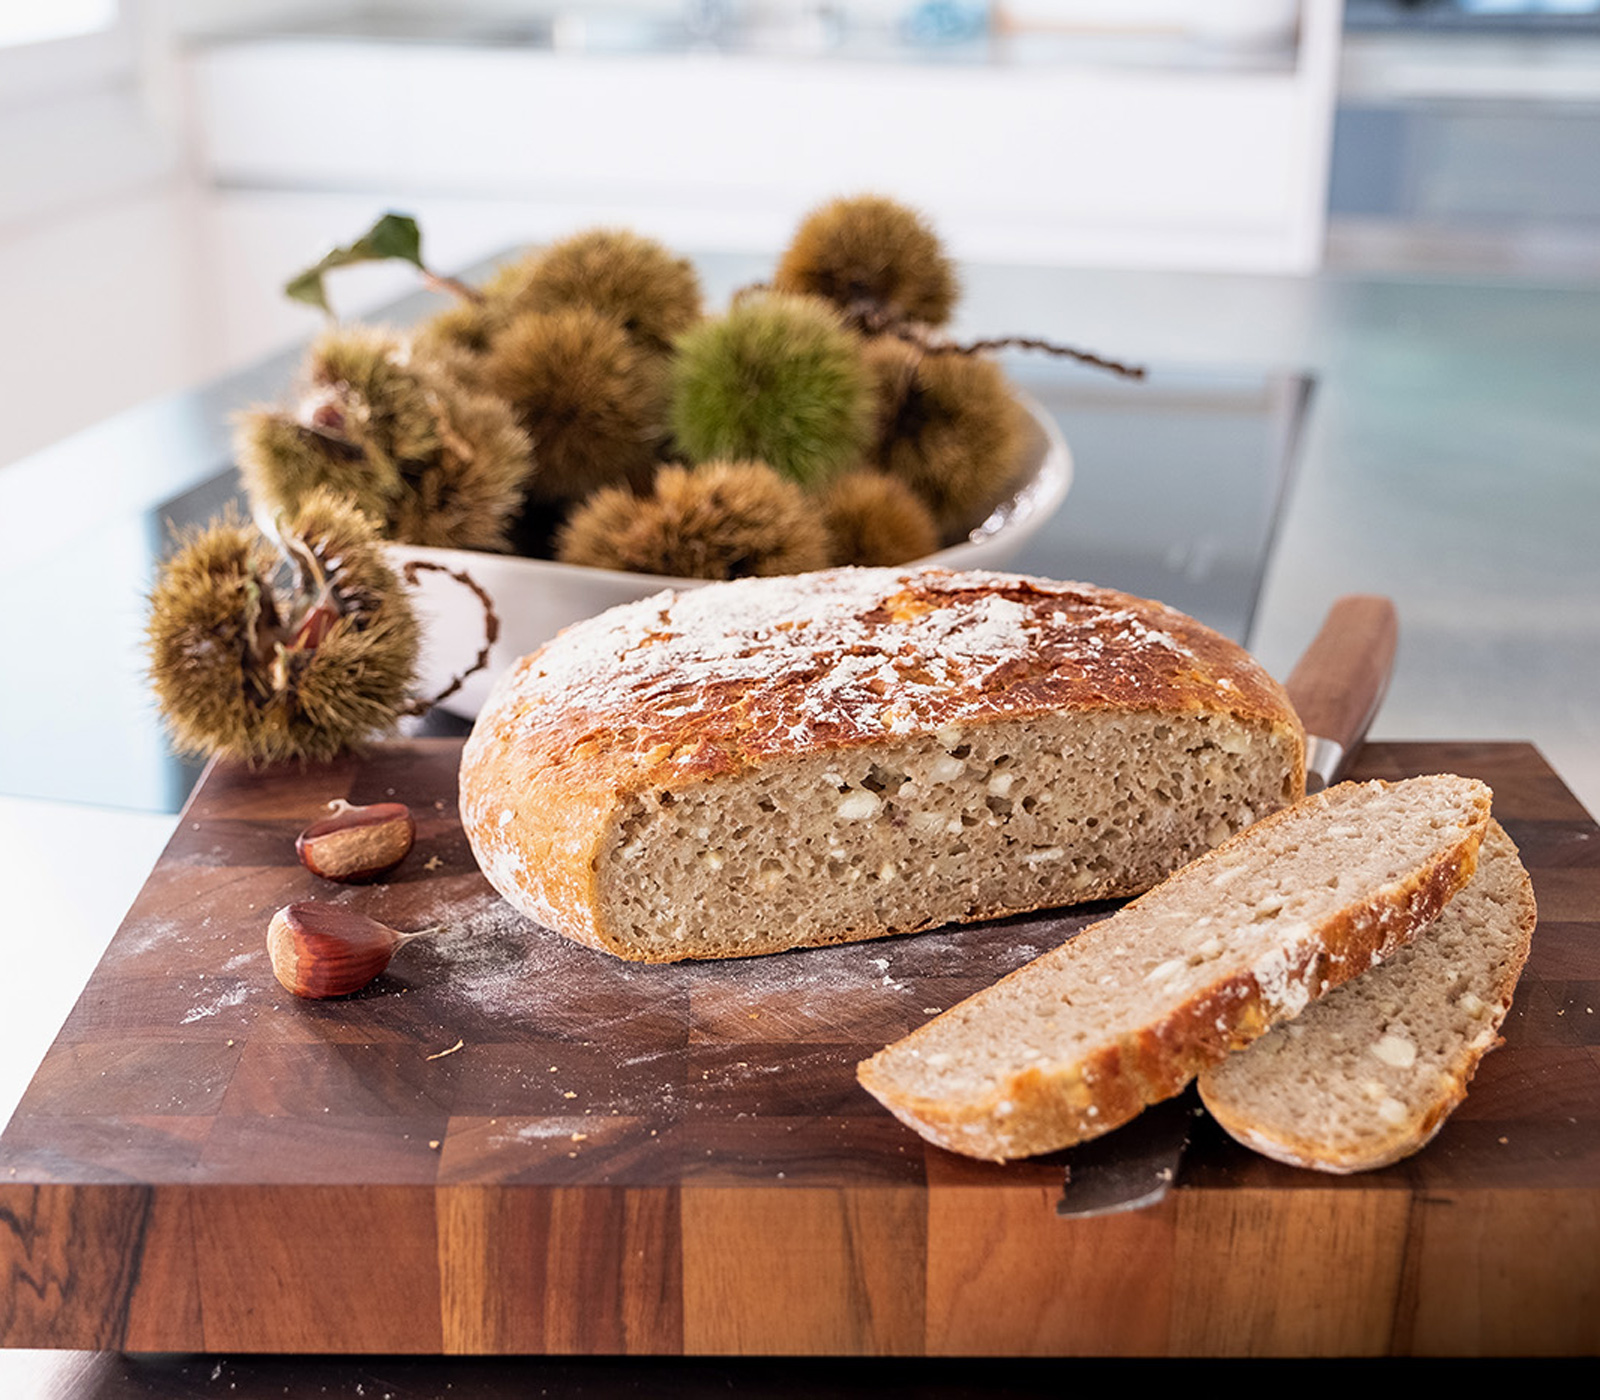 Marroni-Brot